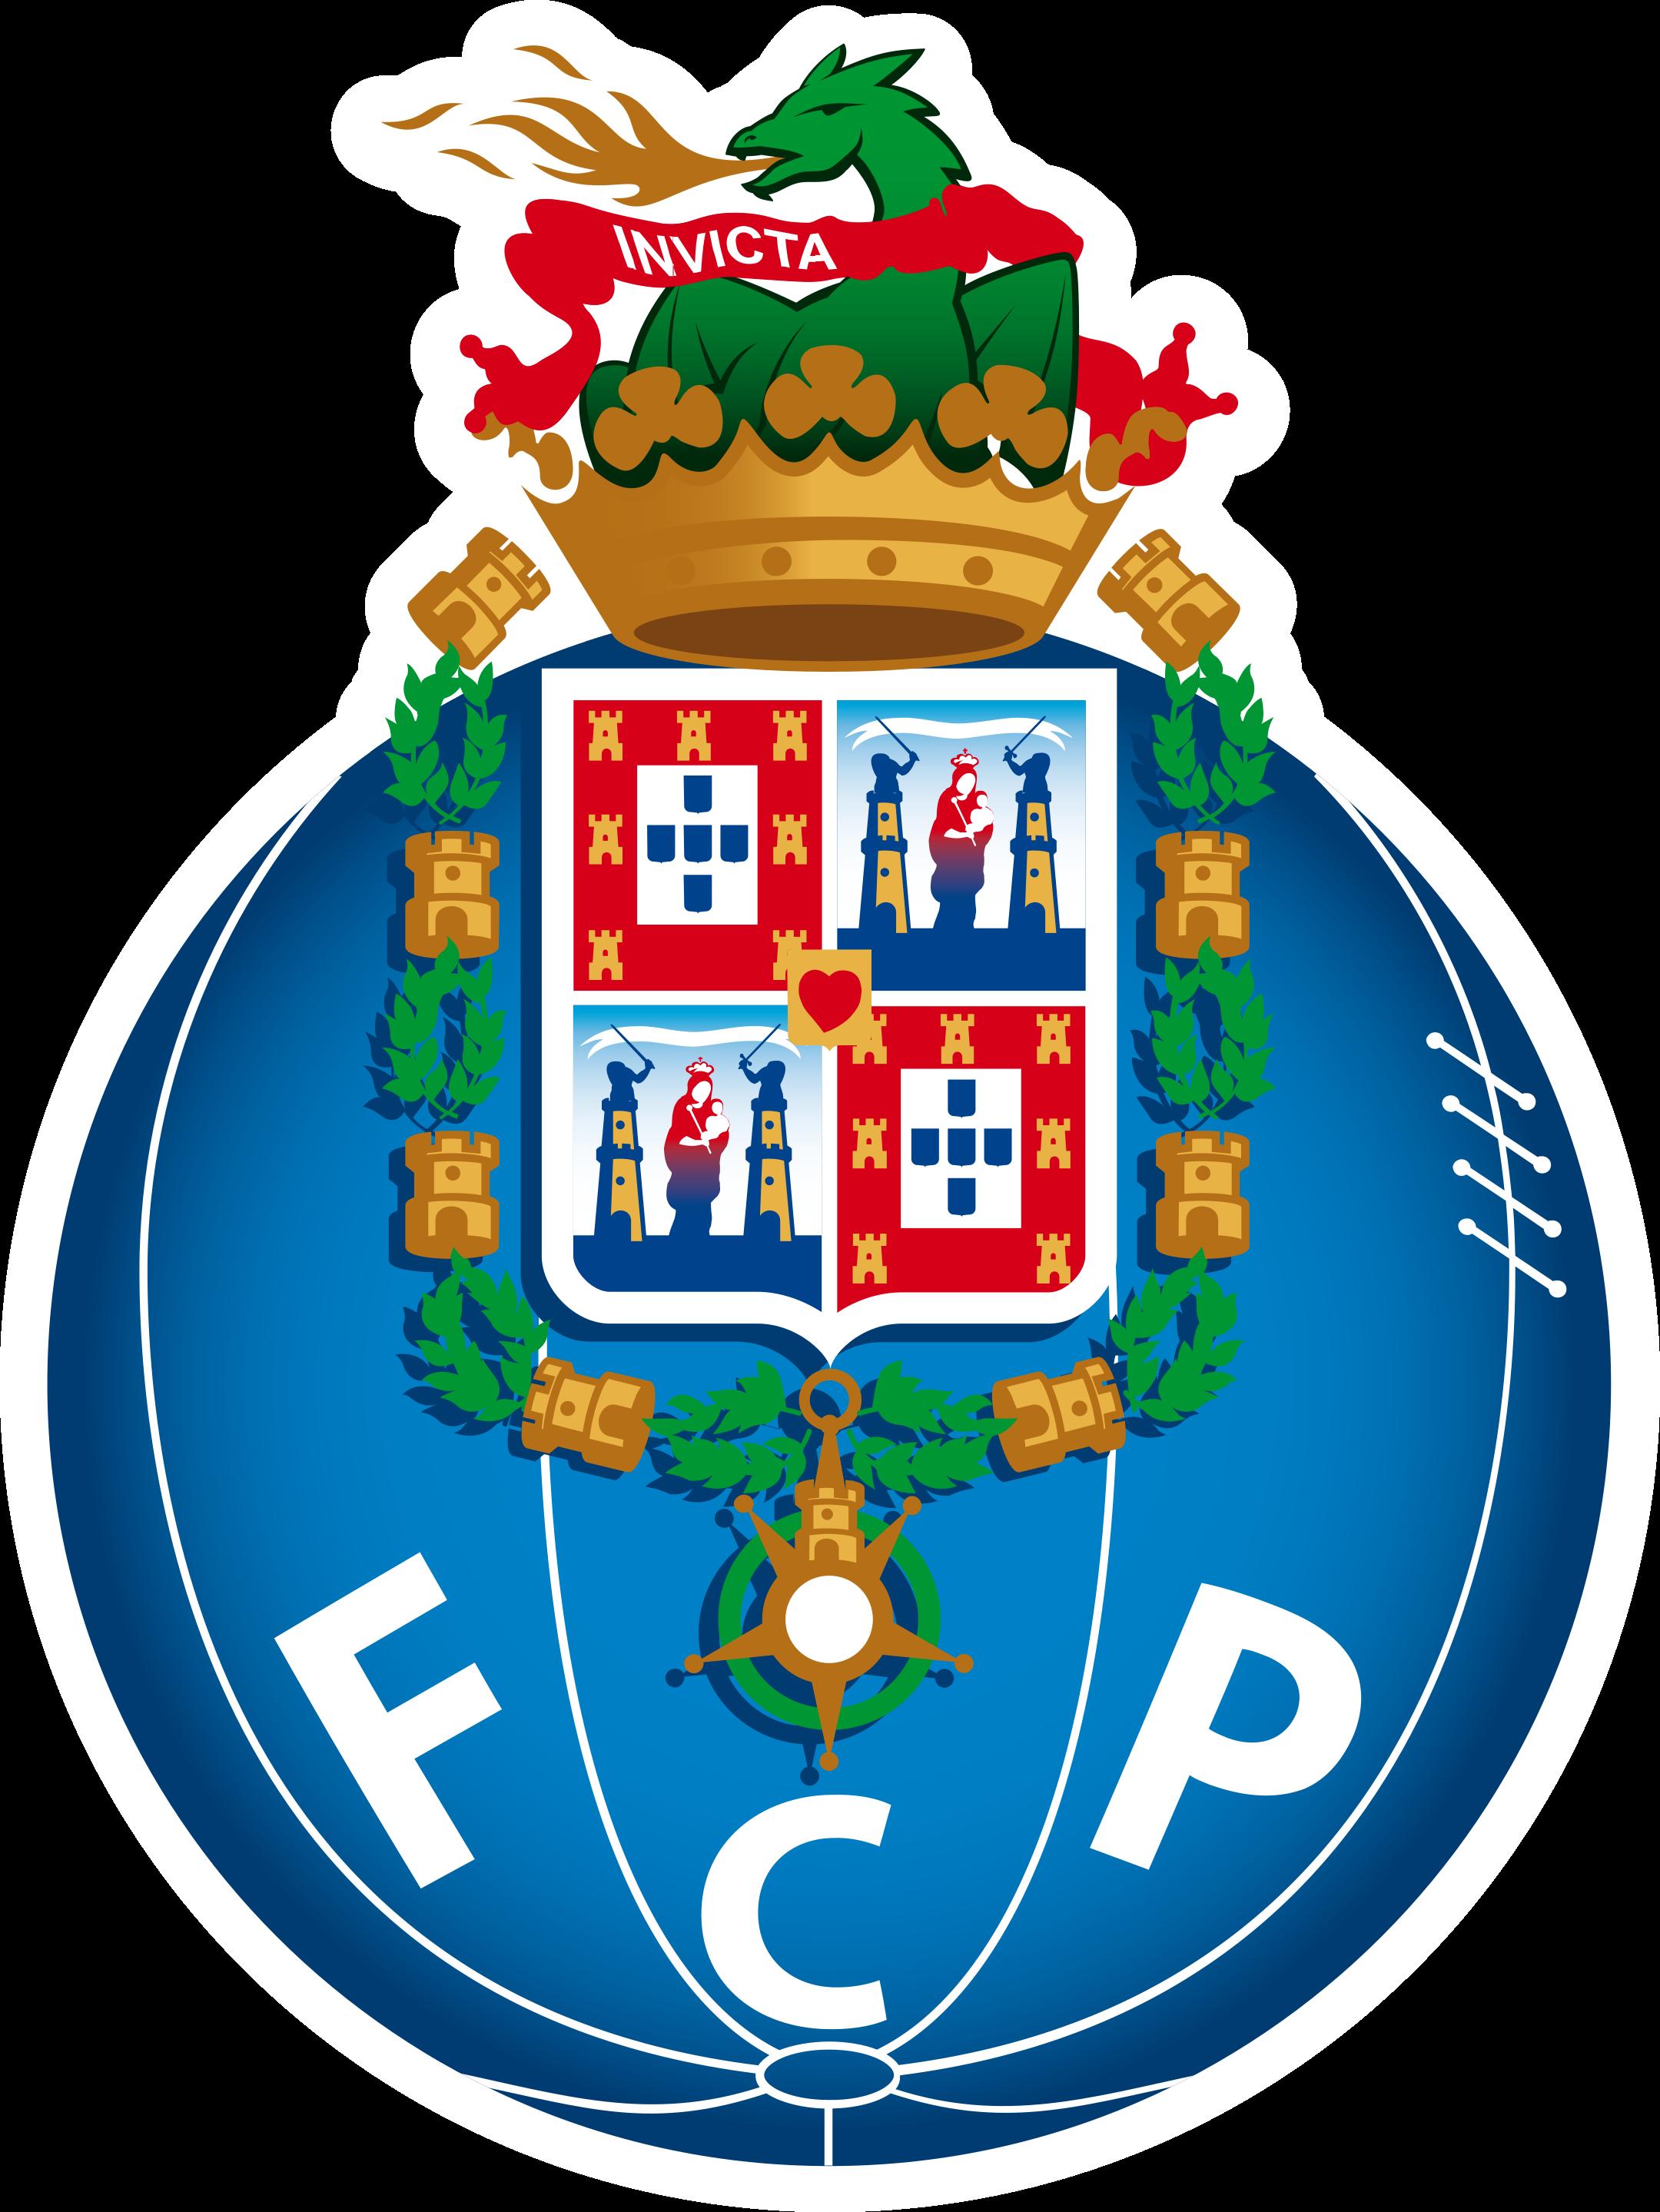 fc porto logo 1 - FC Porto Logo